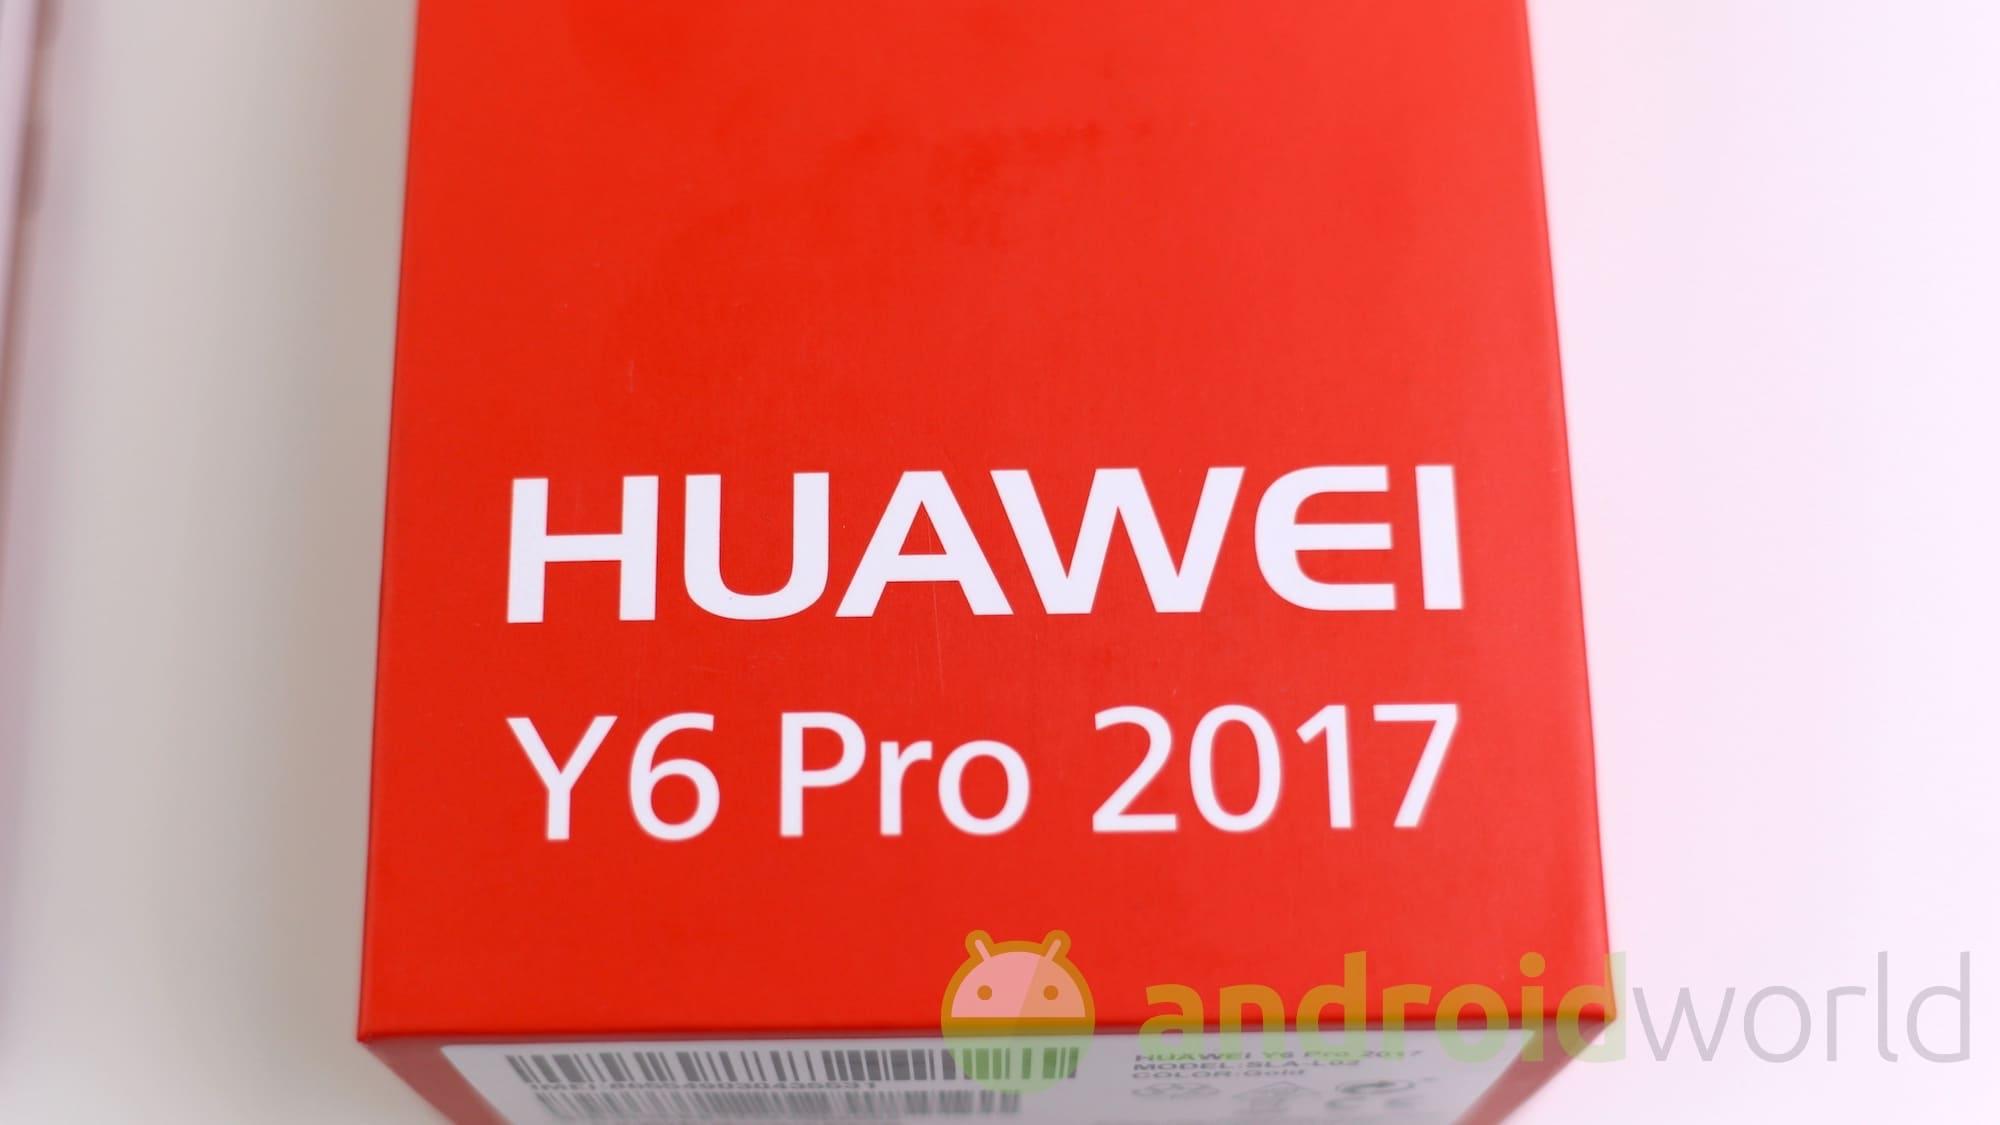 Huawei Y6 Pro 2017 def – 1